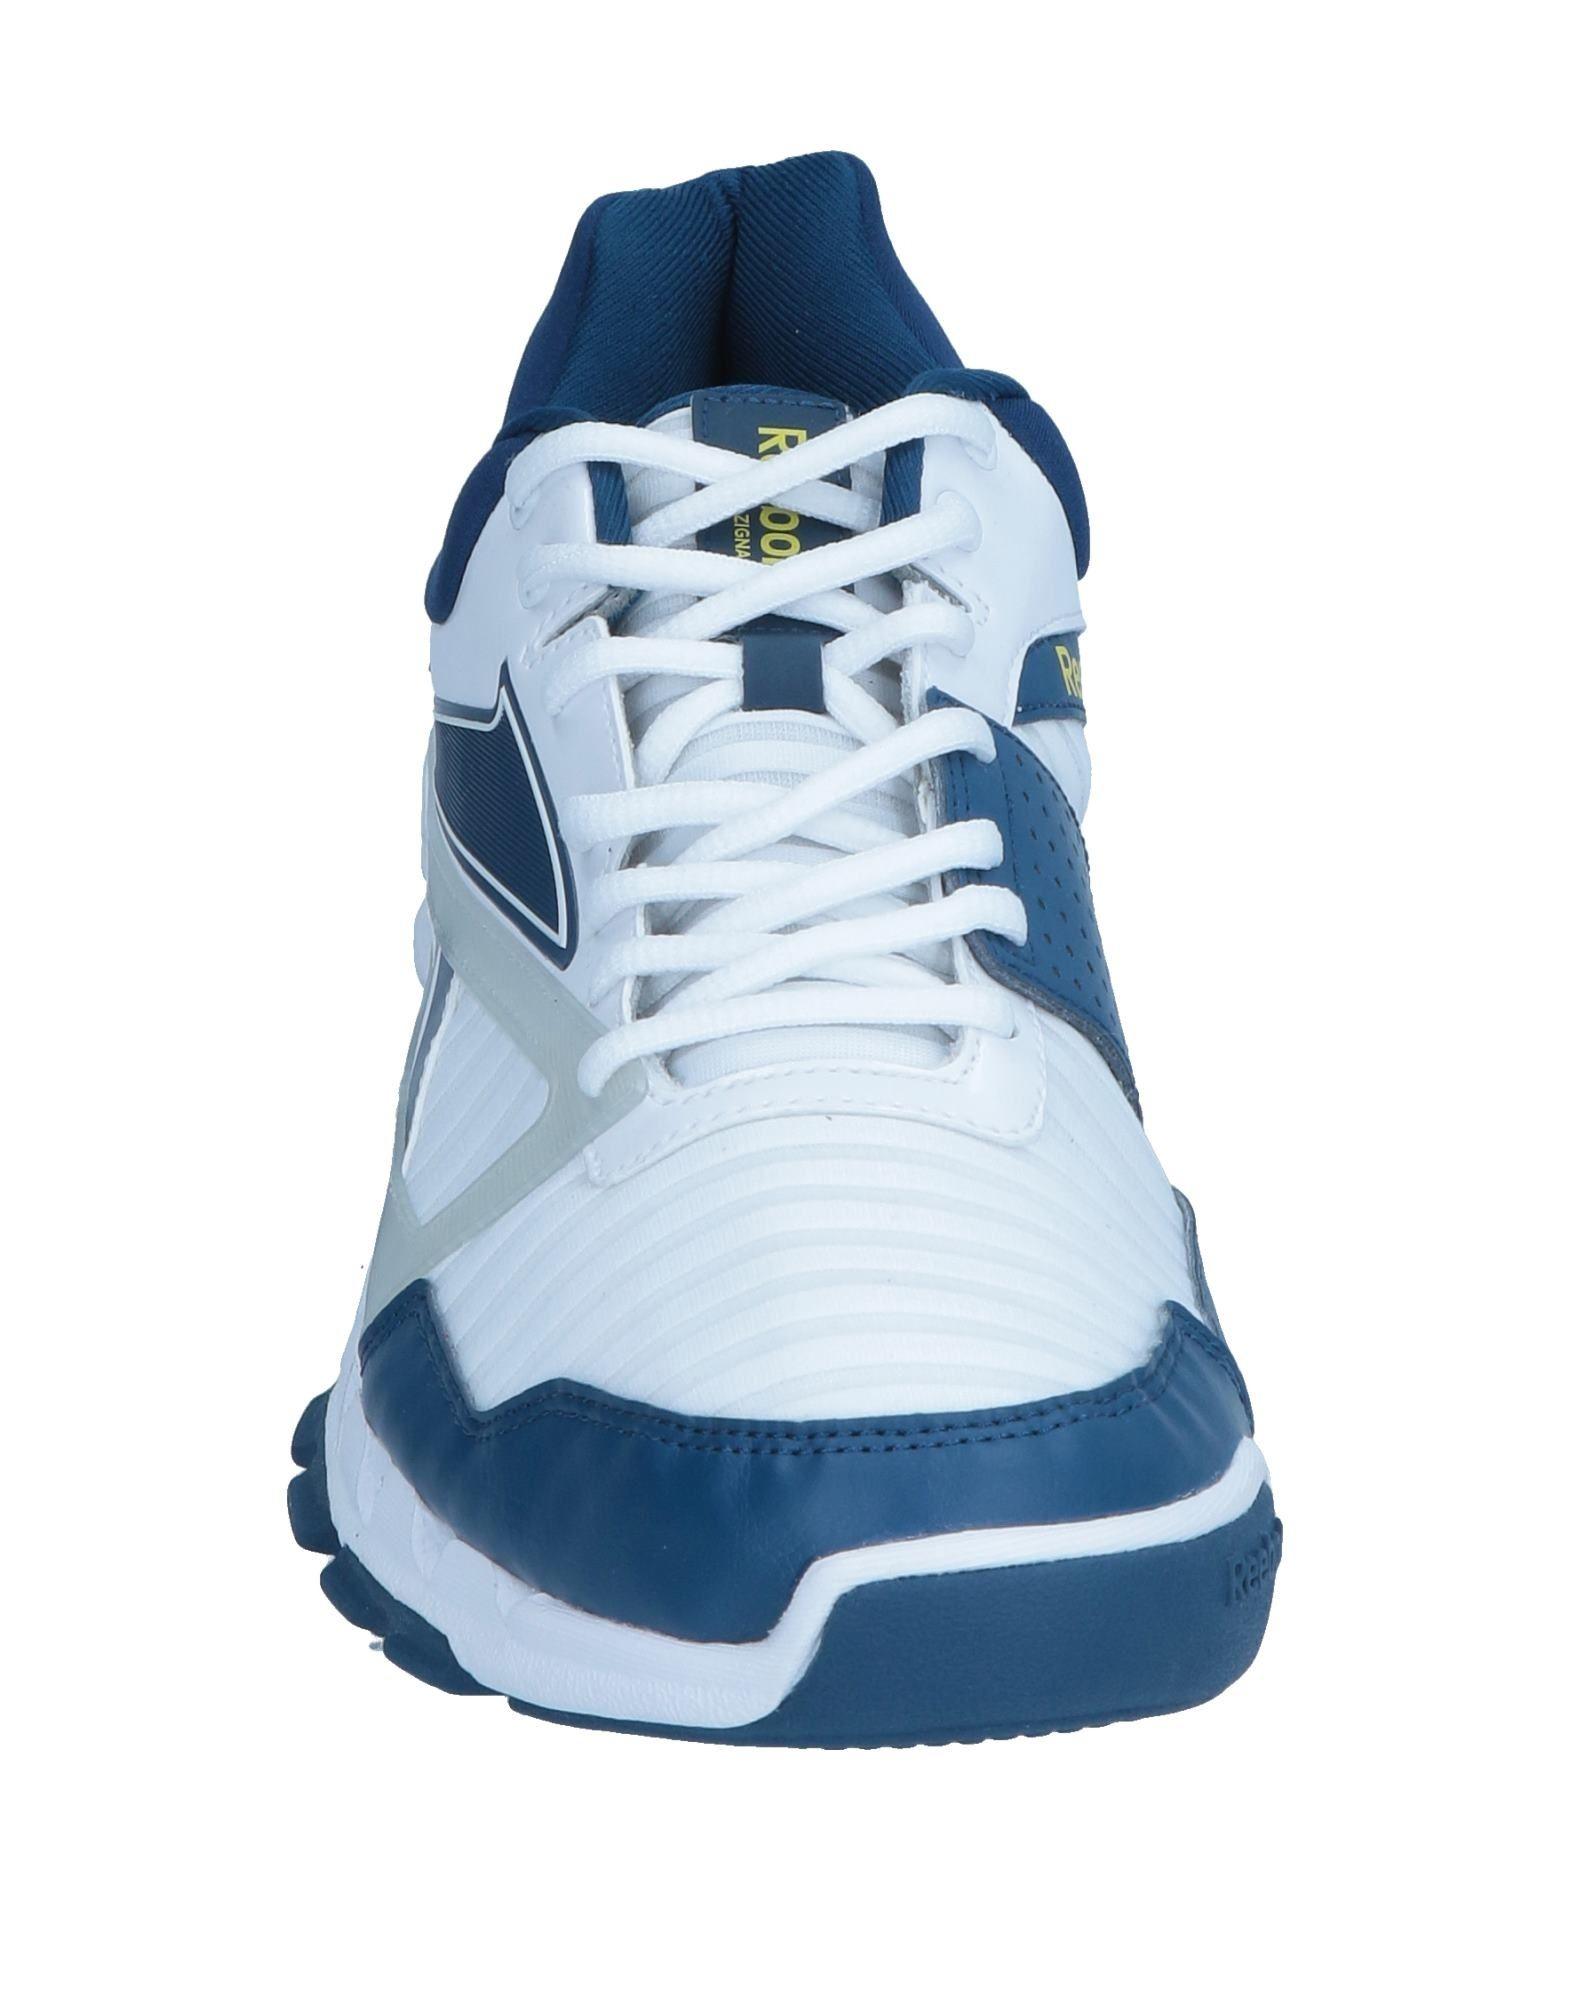 Rabatt Herren echte Schuhe Reebok Sneakers Herren Rabatt  11545502GI a0f98f